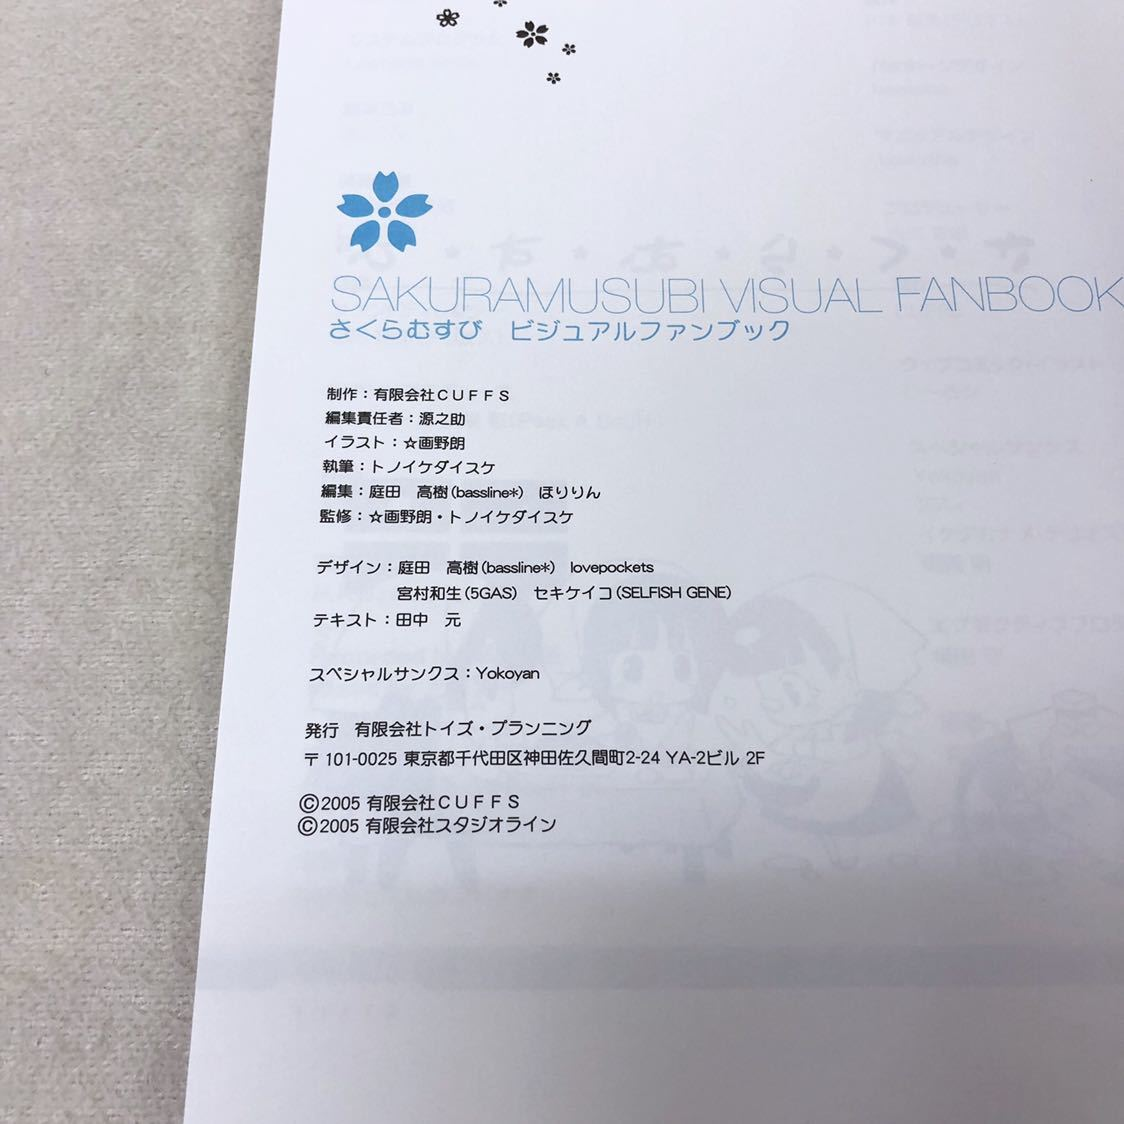 SAKURAMUSUBI VISUAL FANBOOK さくらむすび ビジュアル ファンブック_画像4